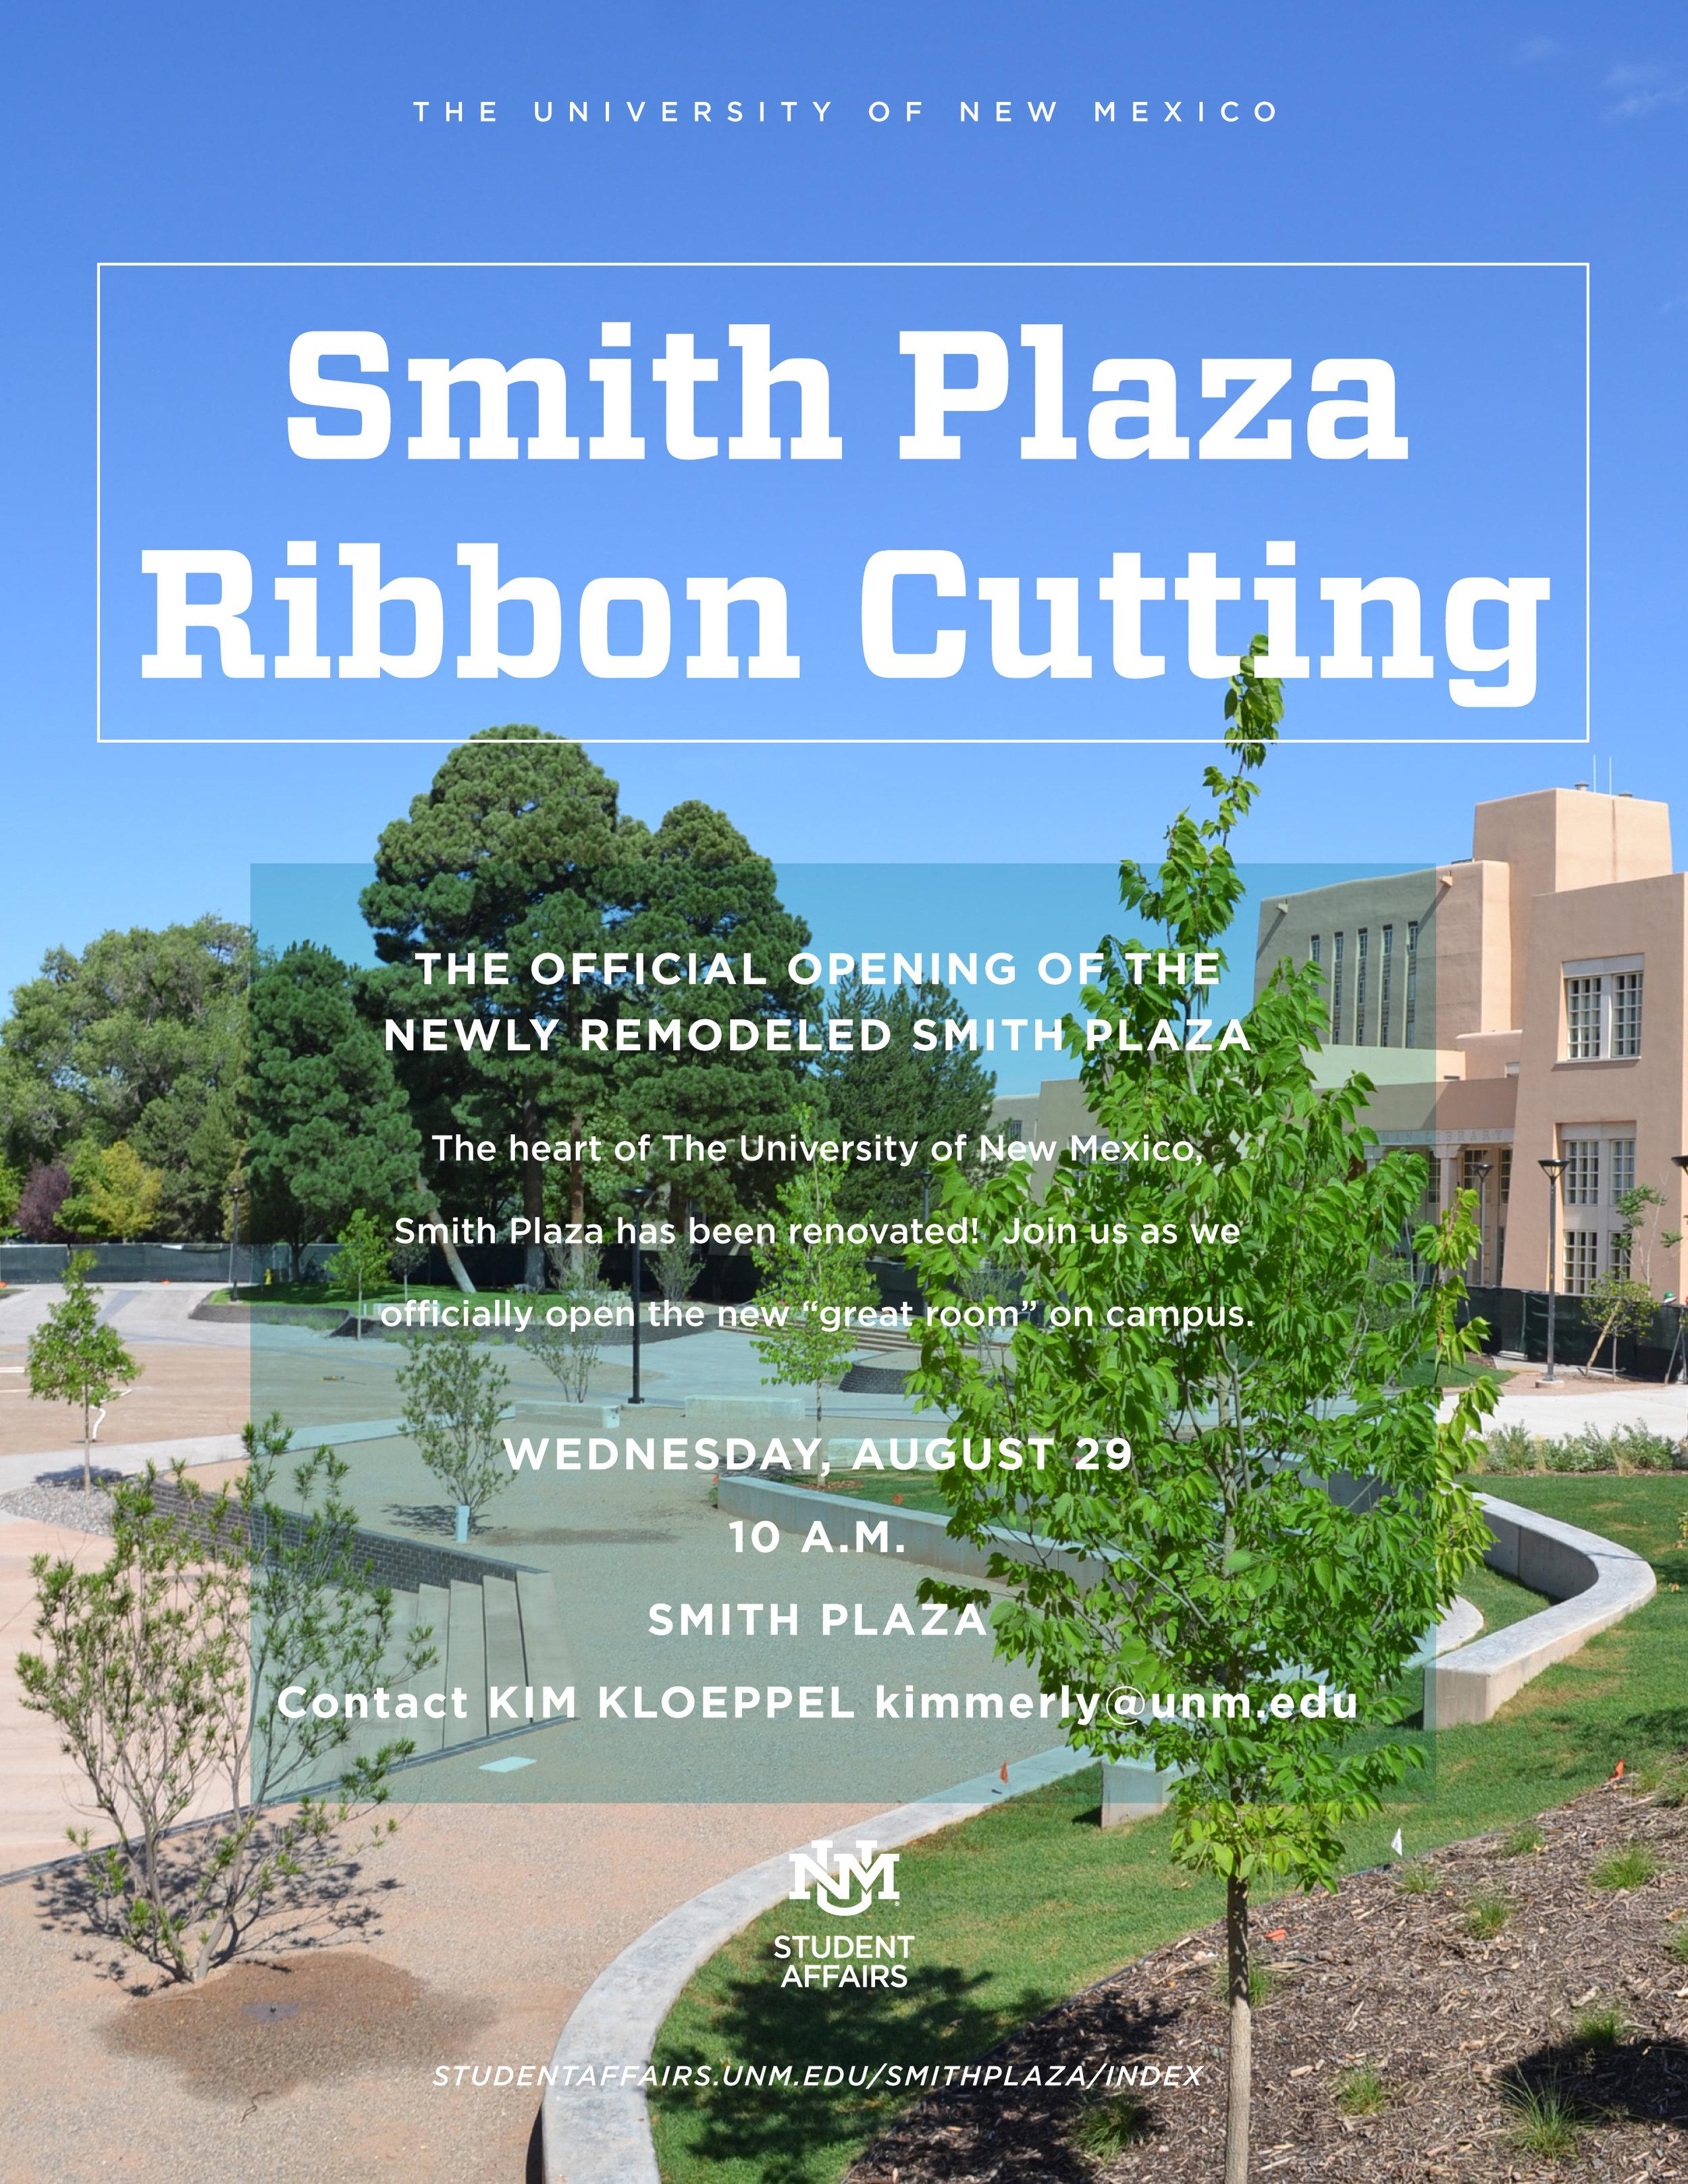 Final SP Ribbon cutting invite.jpg